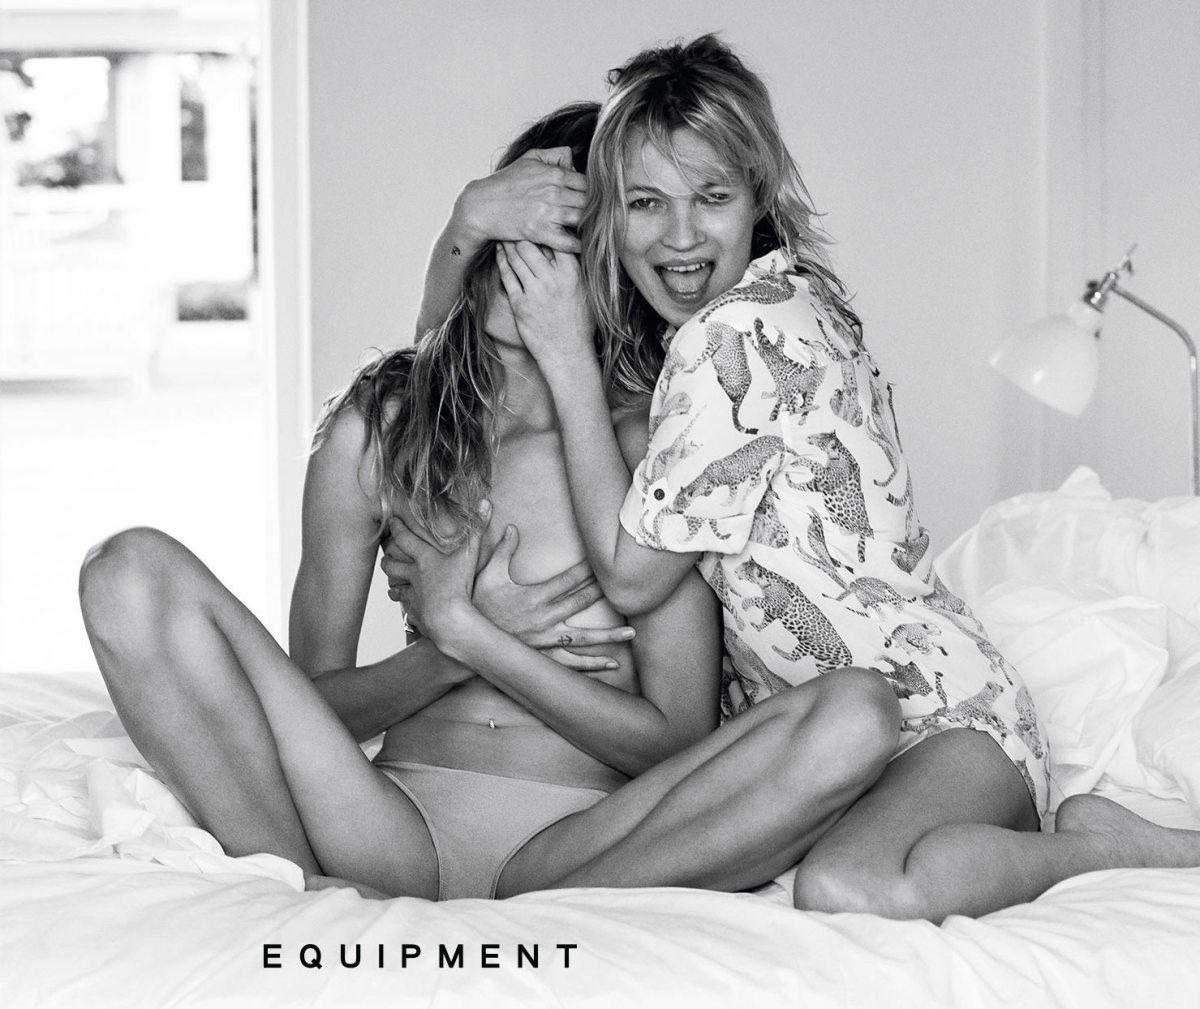 Goals. Photo: Daria Werbowy for Equipment